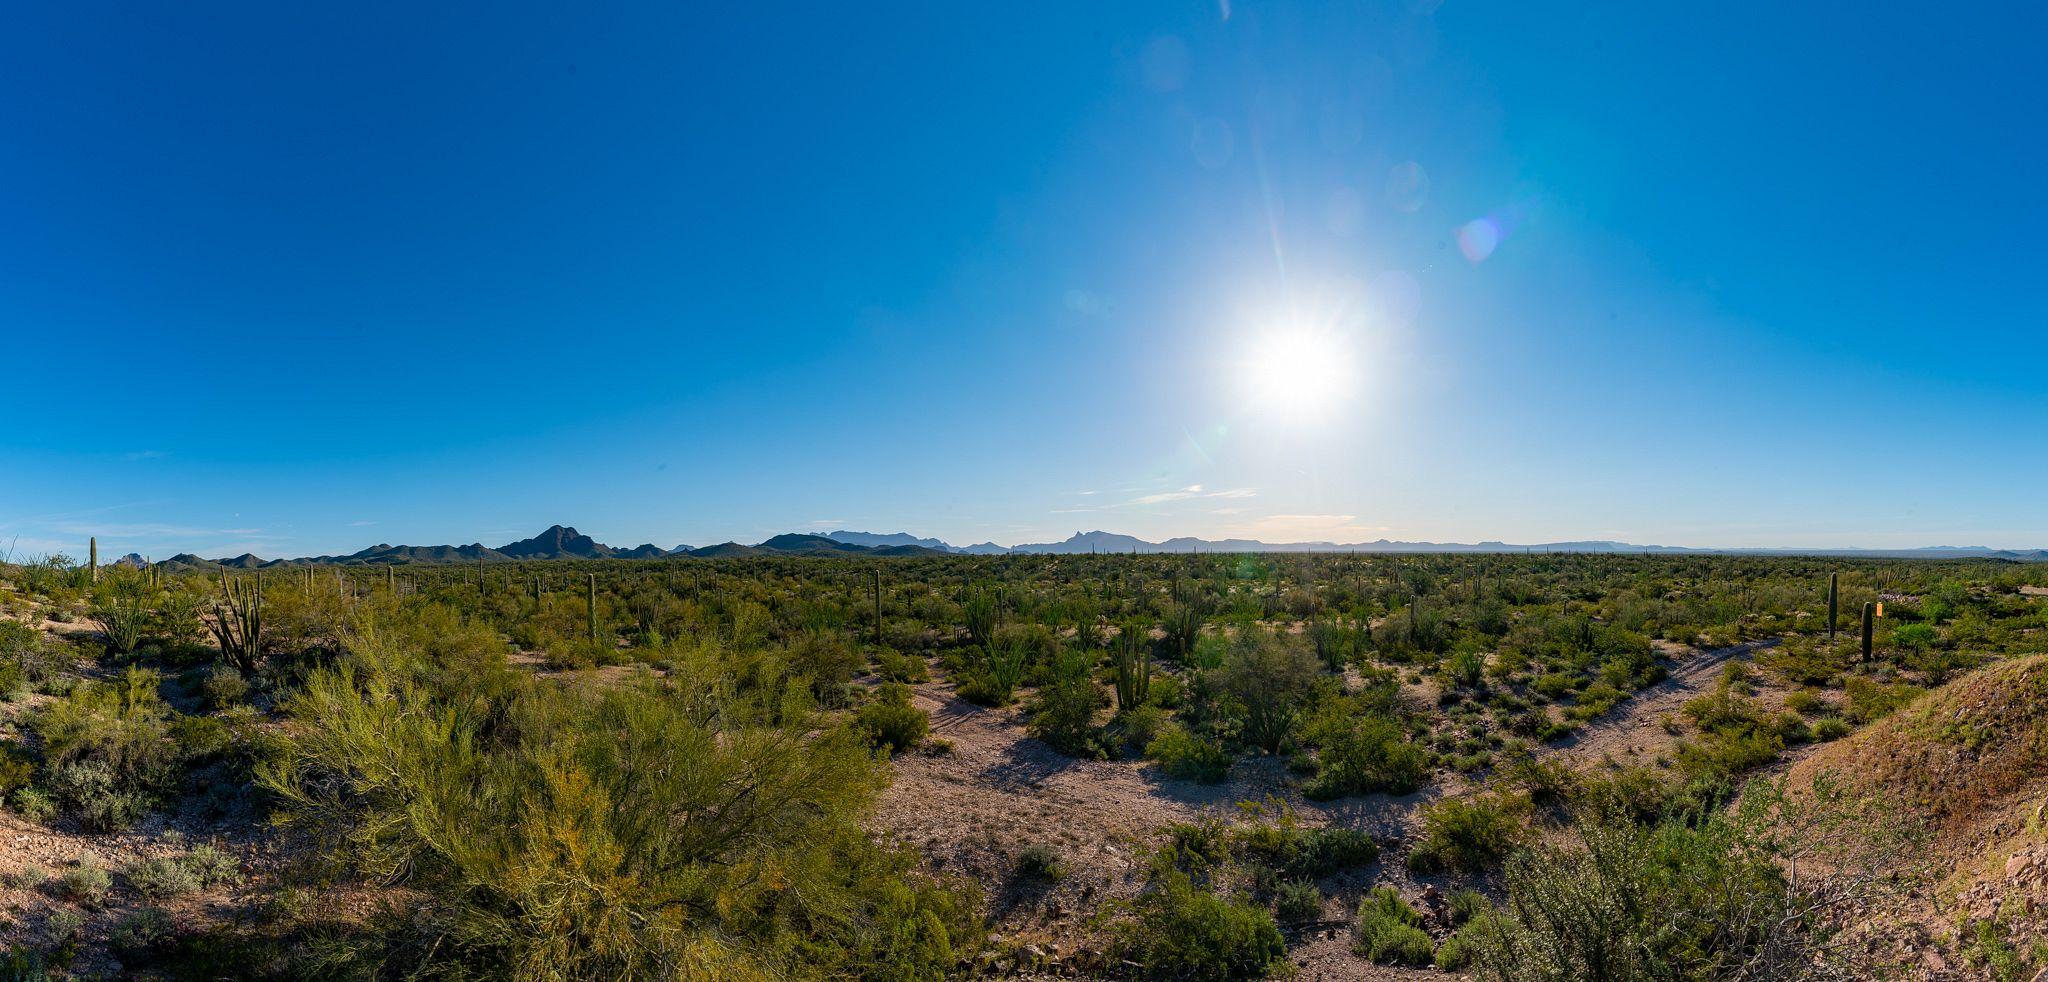 Sunrise over Organ Pipe Cactus National Monument